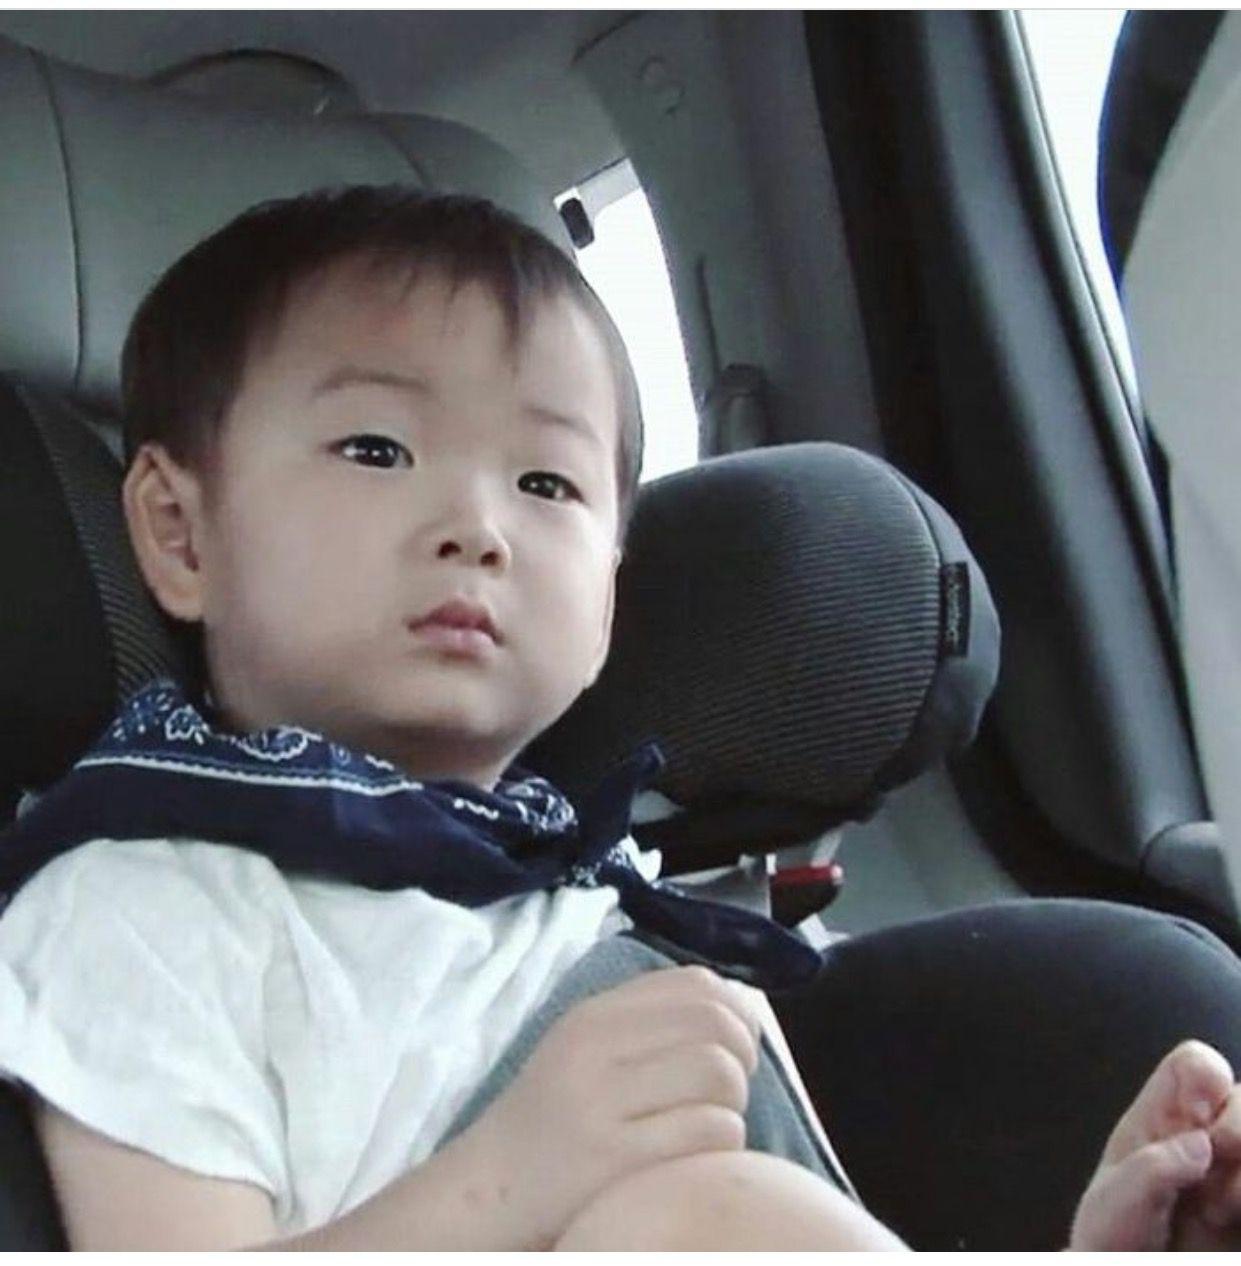 Crkbs2 Daehan Minguk ManSe LalitaMuangman Songs Cute Triplets